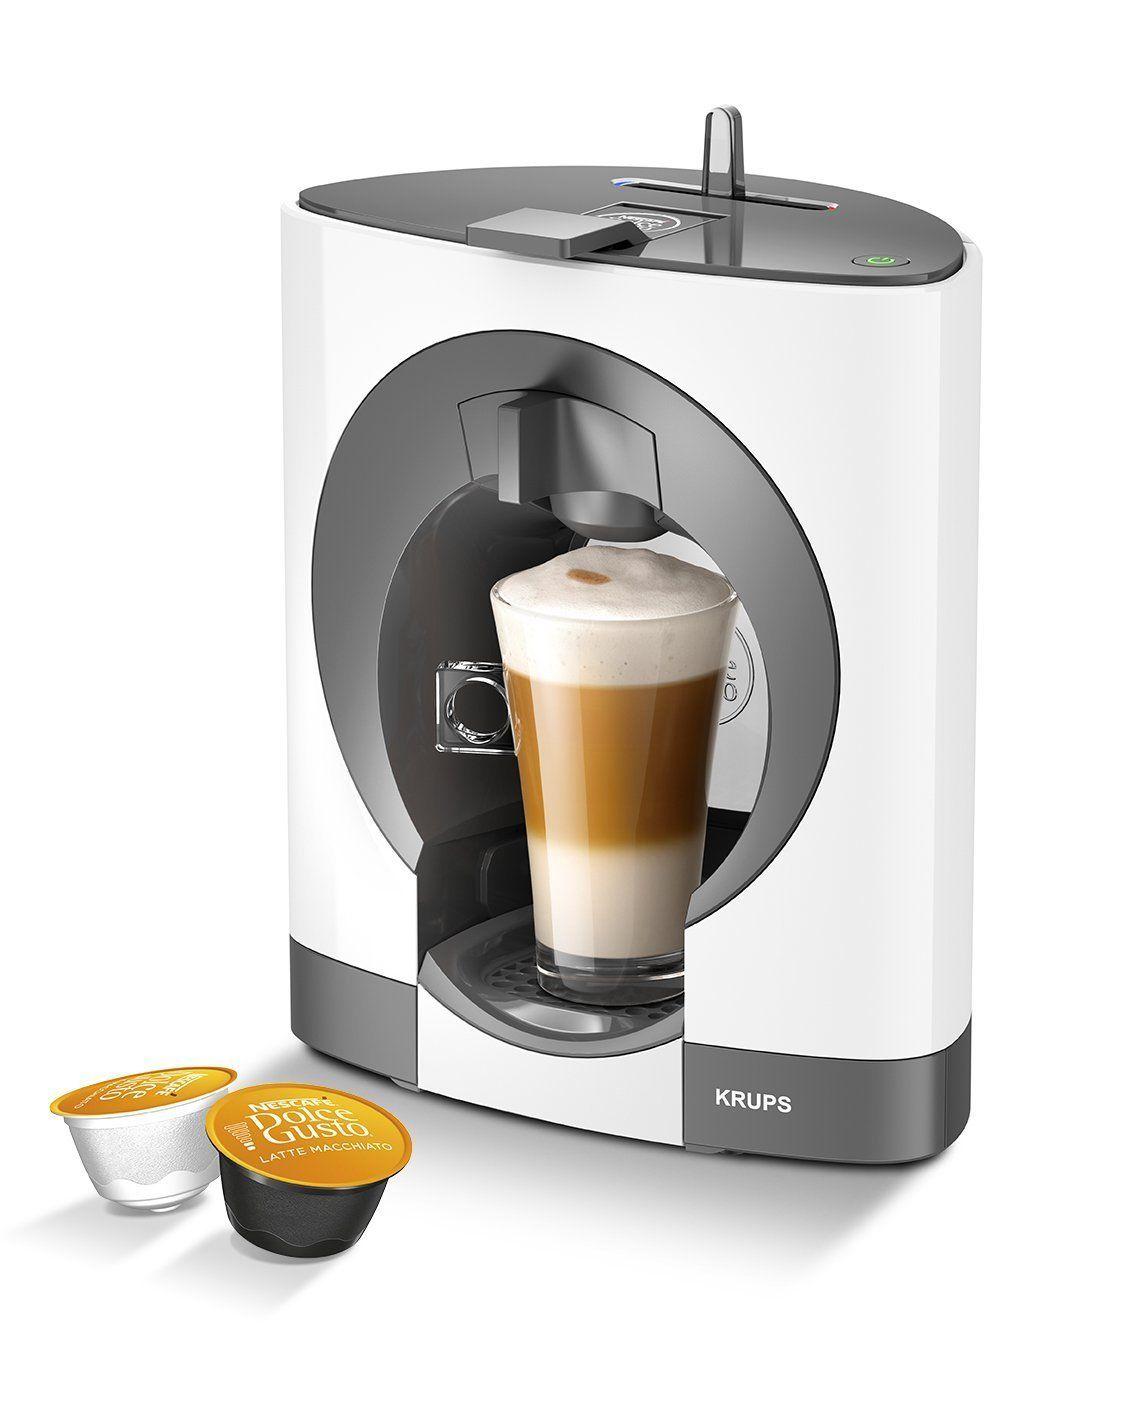 nescafe dolce gusto oblo manual coffee machine by krups white - Industrial Coffee Maker